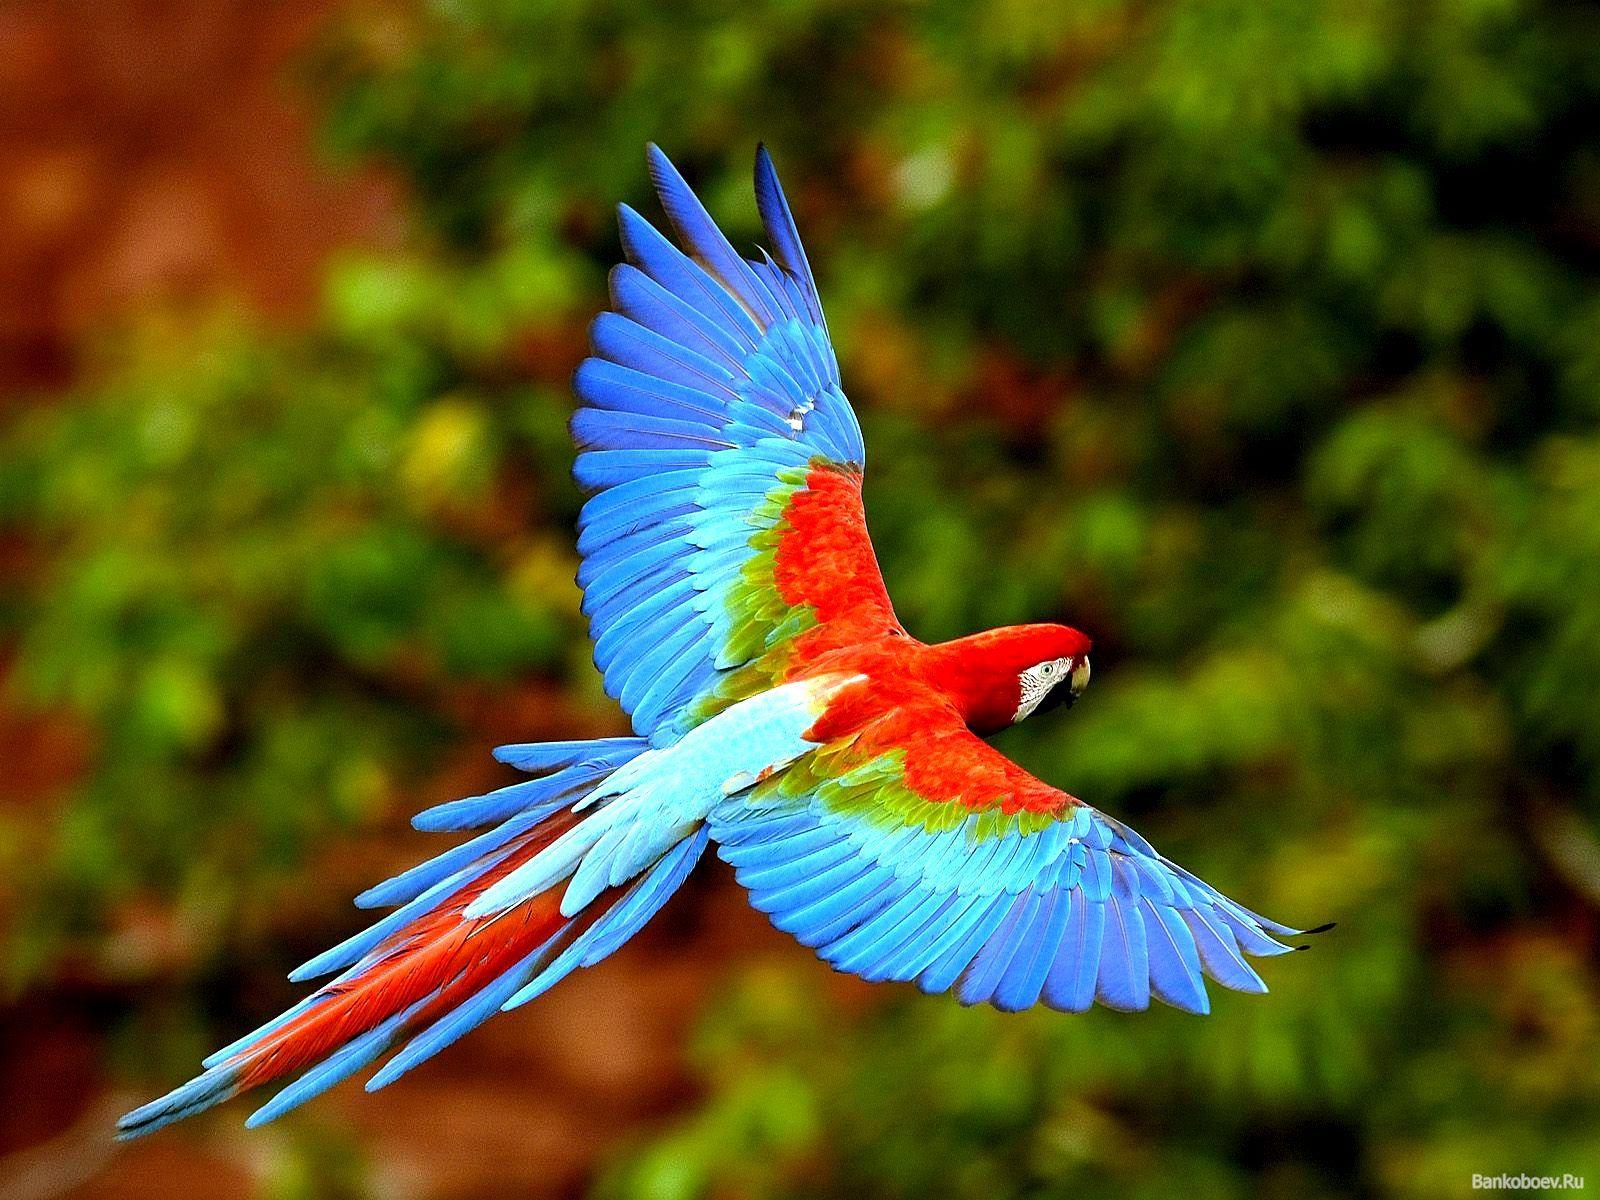 Gorgeous bird flying photo